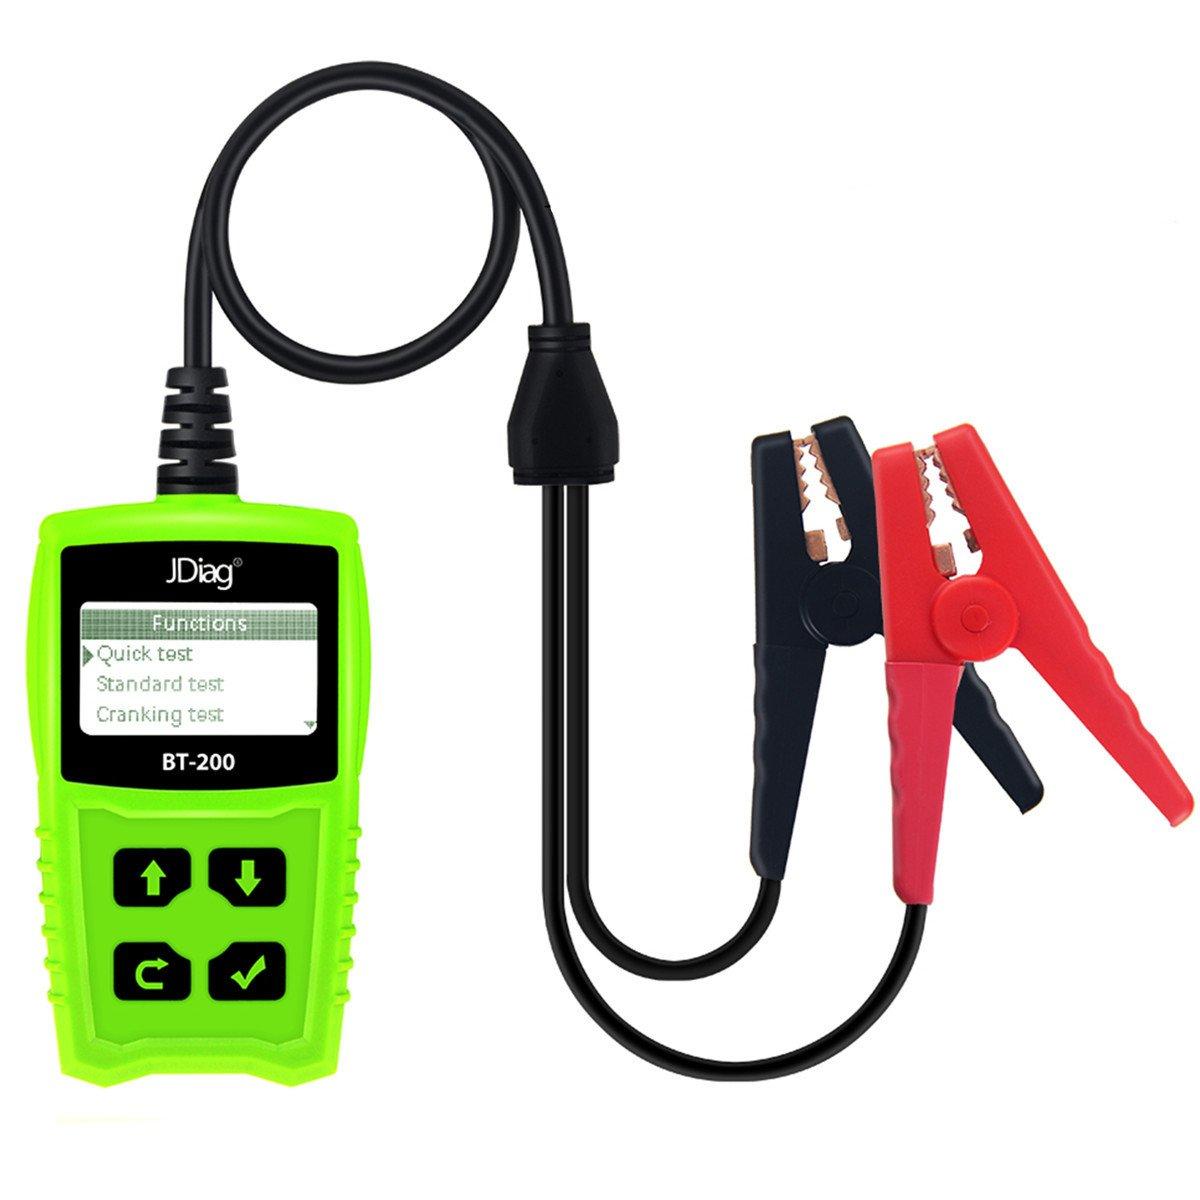 JDiag FasCheck BT-200 Professional Car Load Battery Tester 12V 100-2000 CCA 220AH Digital Battery Analyzer Bad Cell Test Tool for Automotive/Truck/Motorbike Etc(Green) by JDiag (Image #5)